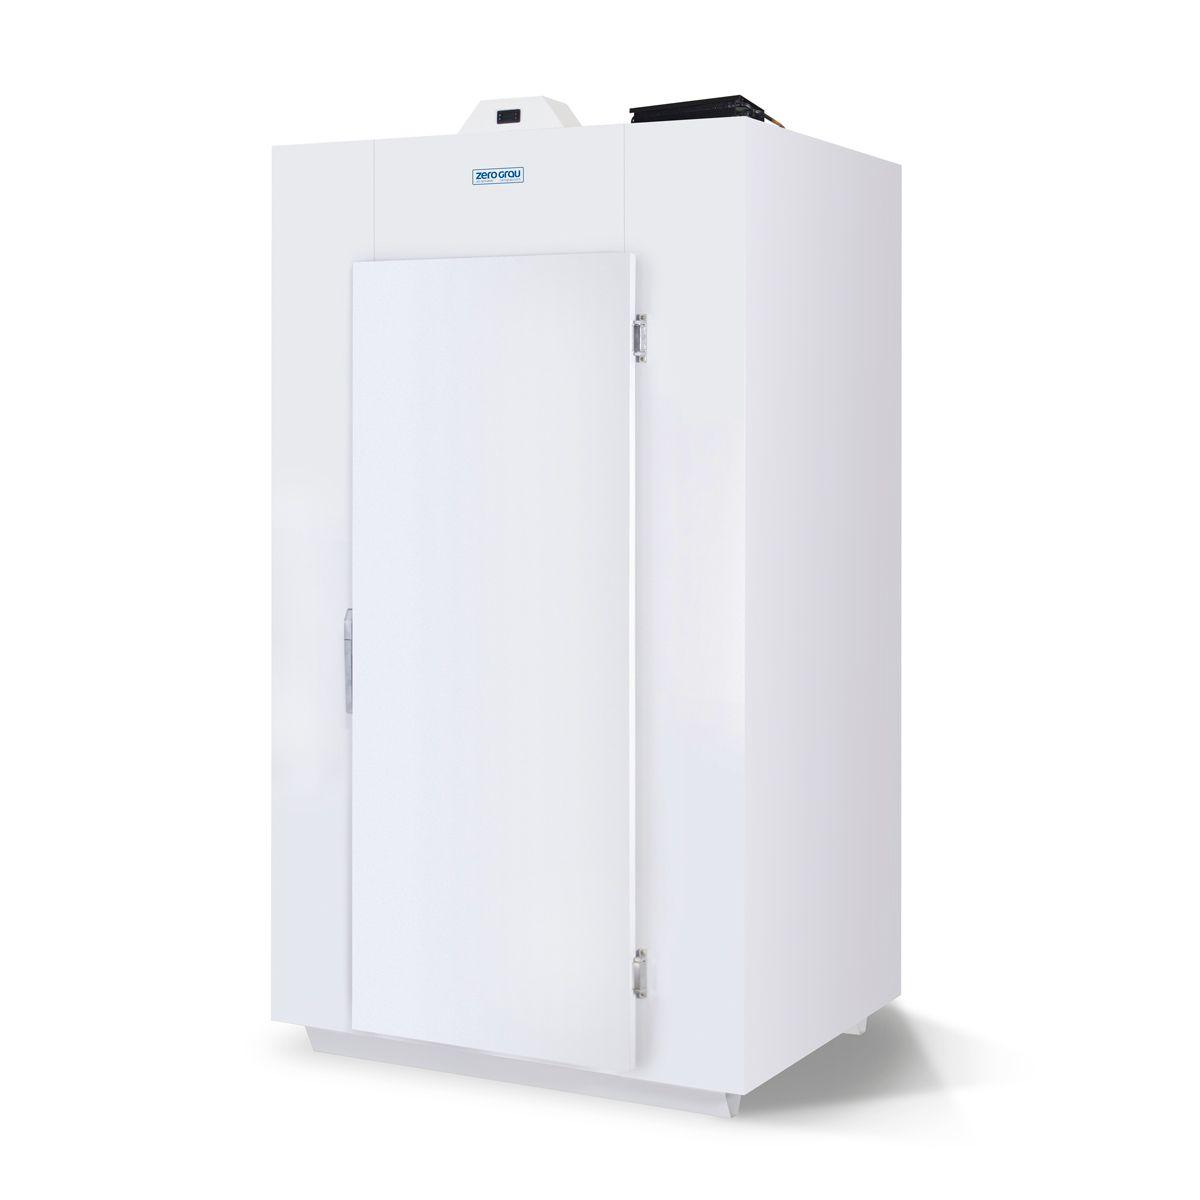 Freezer 1800 Litros